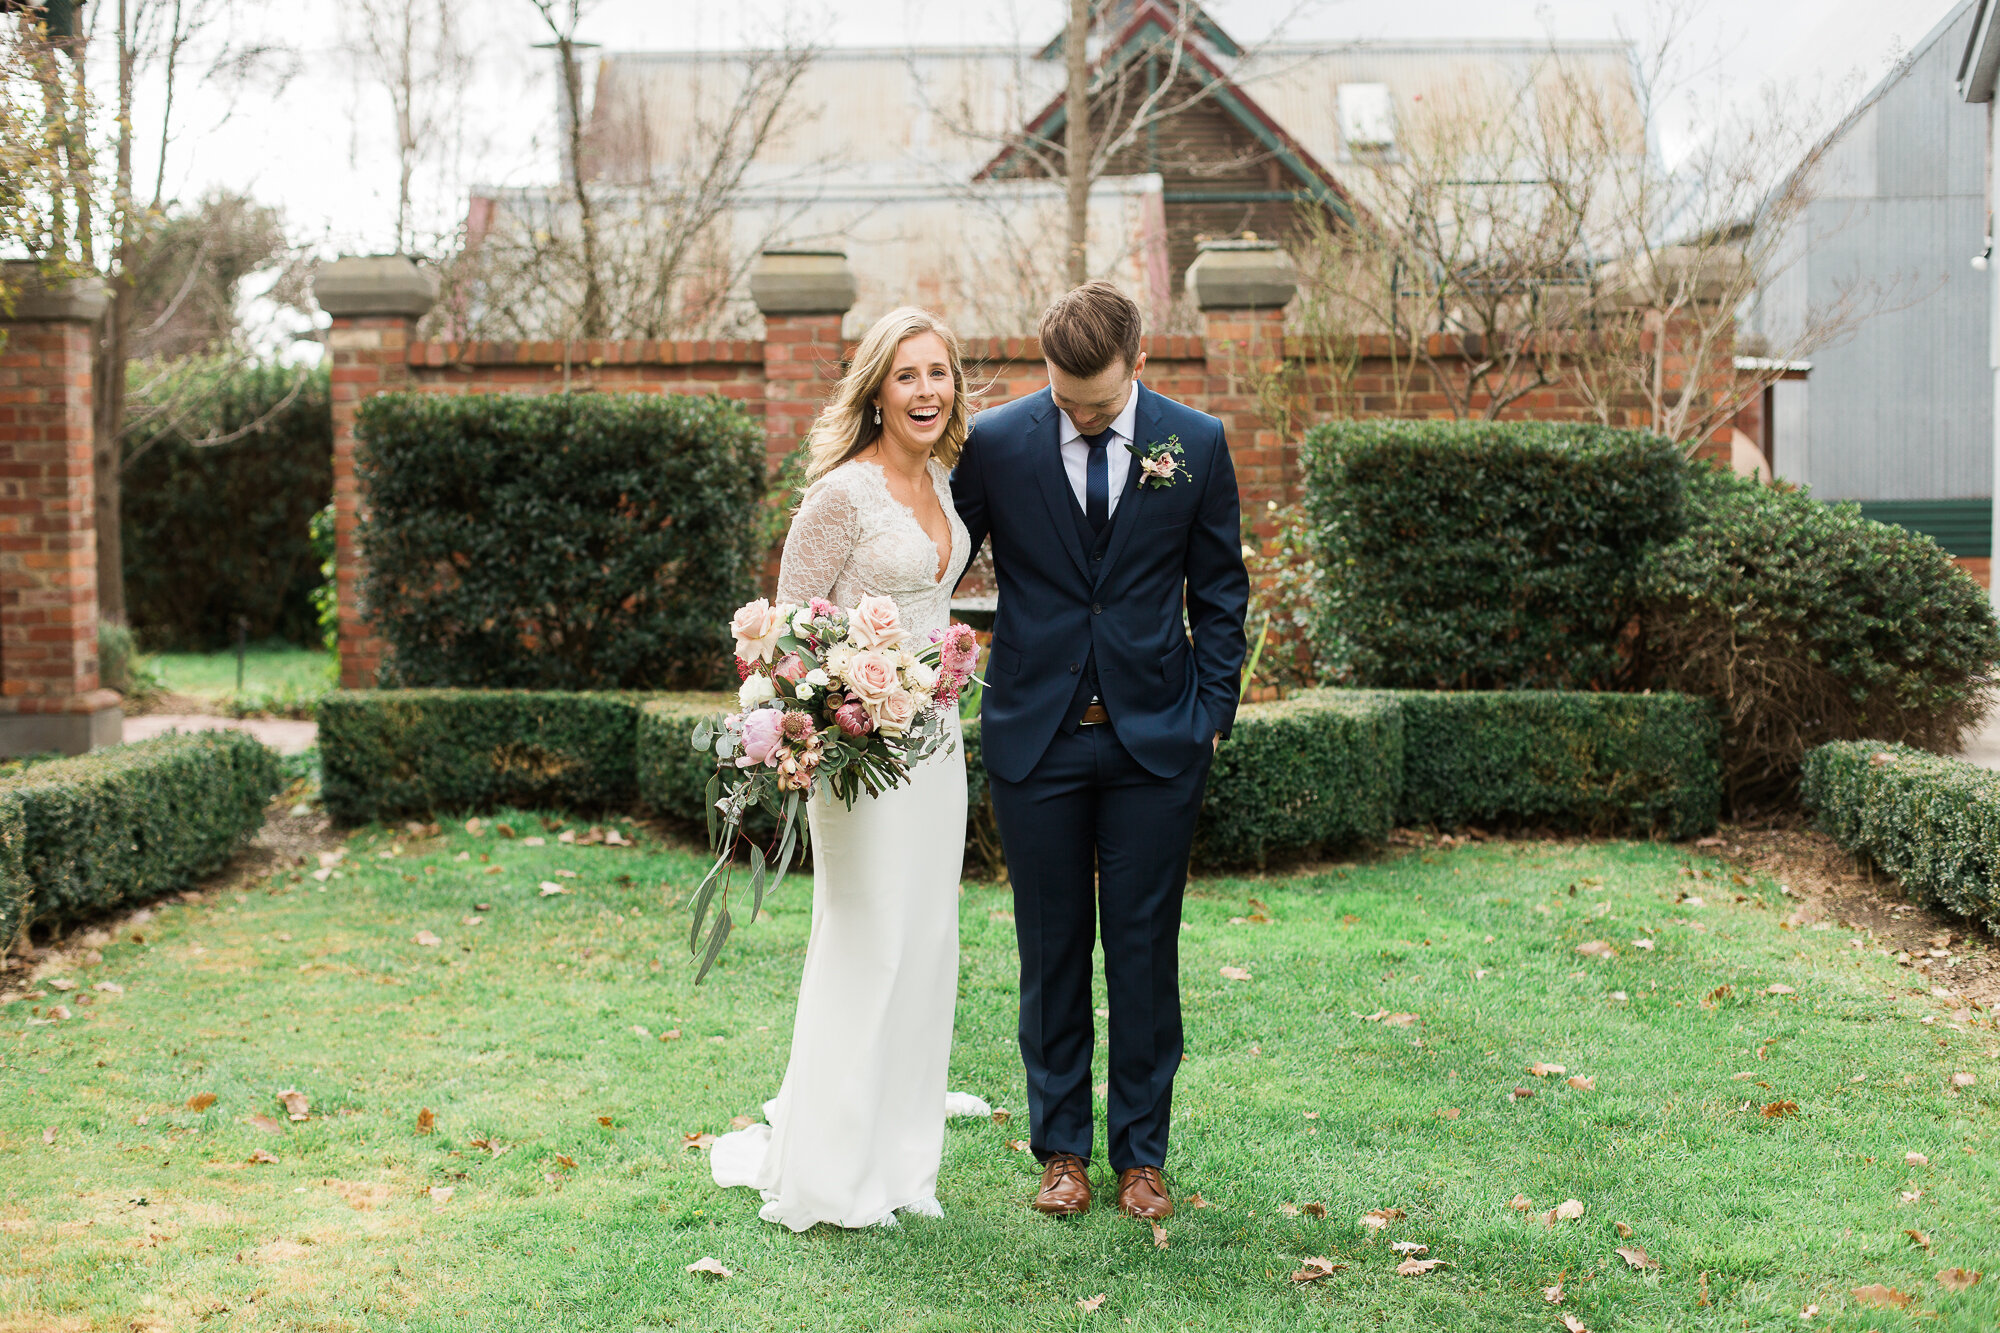 melbourne-wedding-14.jpg